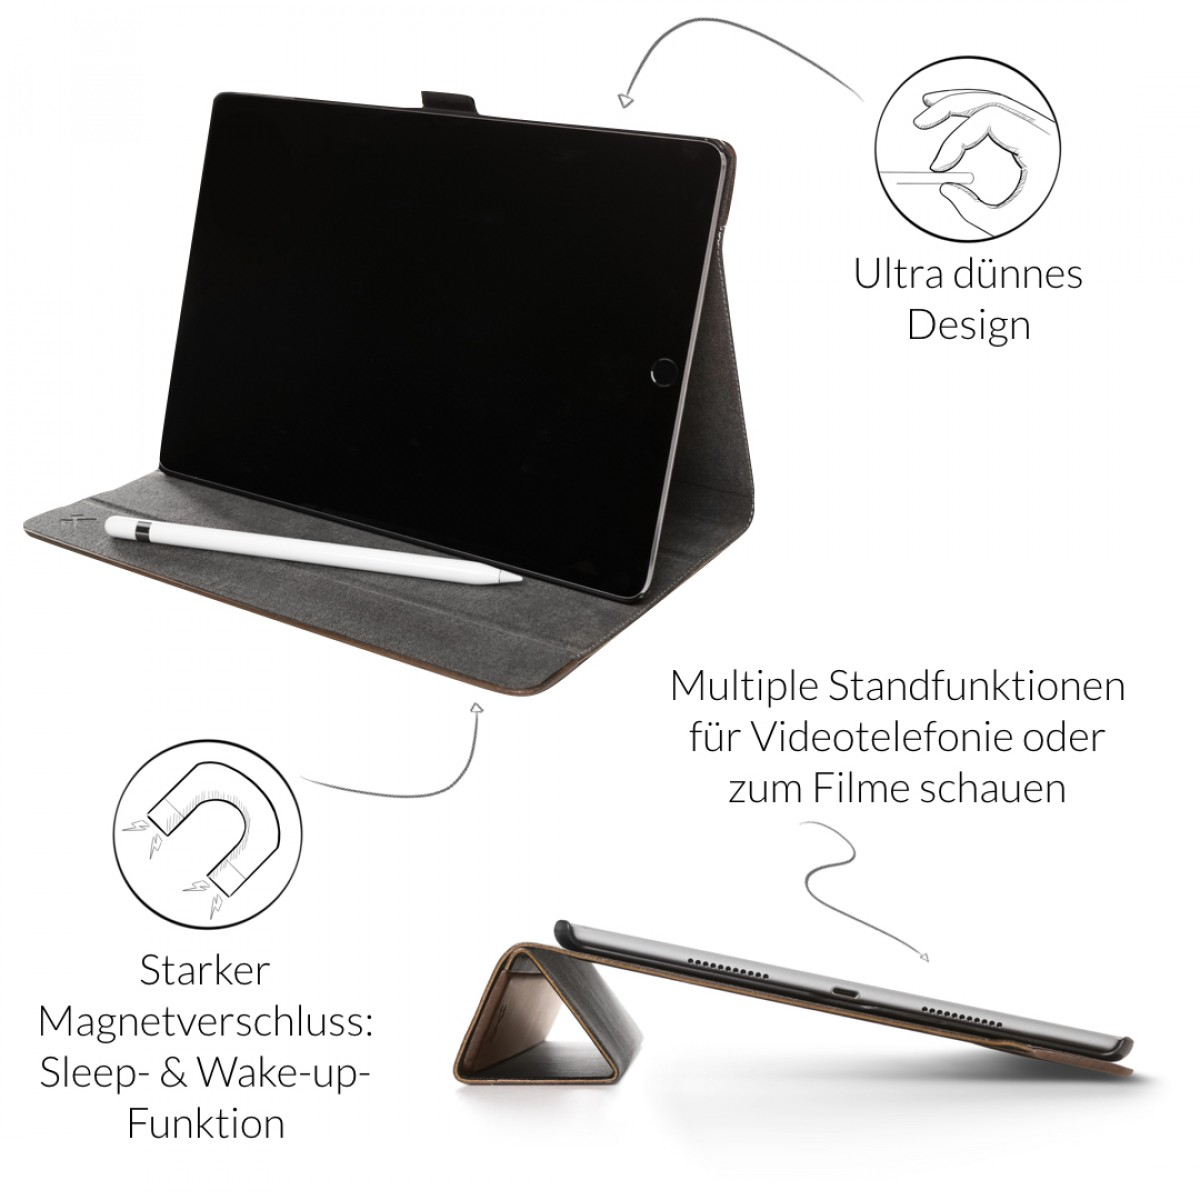 Woodcessories - EcoFlip iPad - Premium Design Case, Cover, Hülle für das iPad aus Walnuss Holz & veganem Leder m. Standfunktion (iPad Air 2)